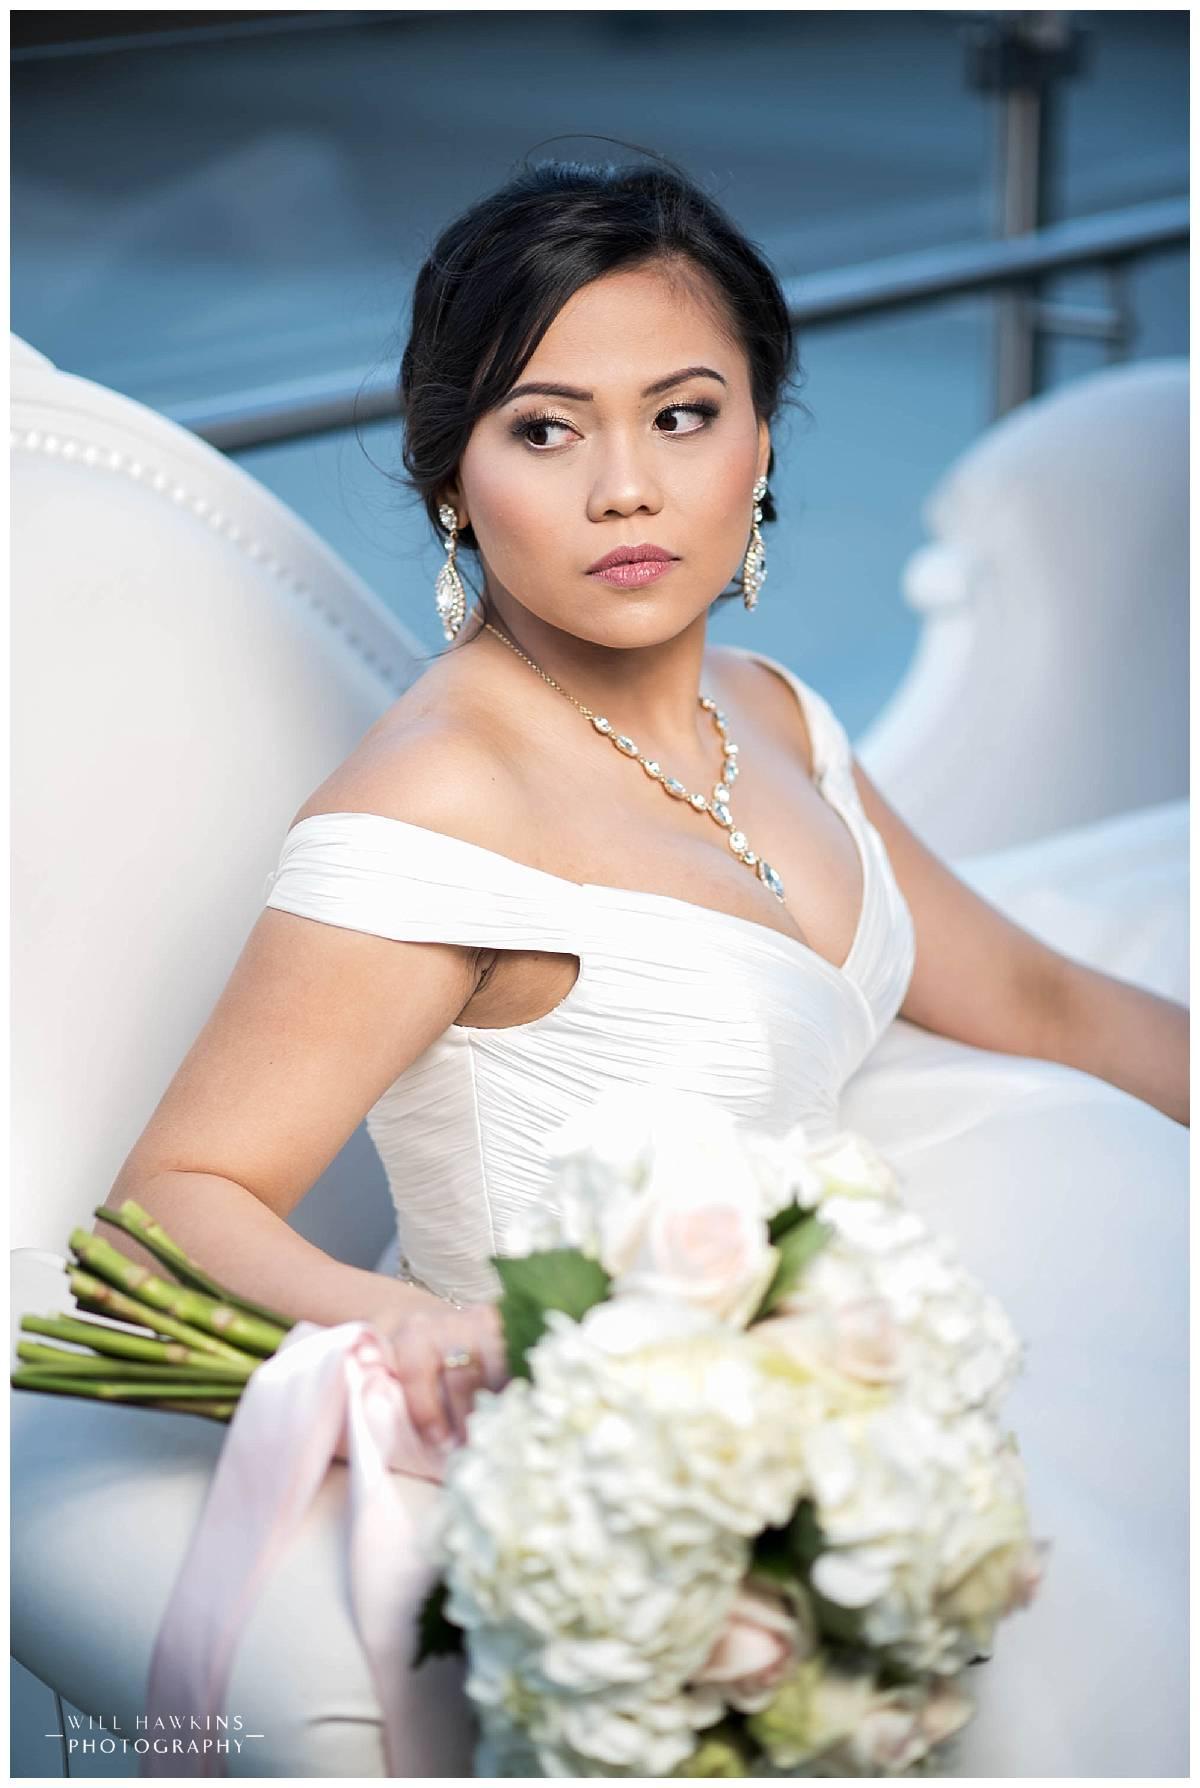 Will Hawkins Photography Bridal Portraits Hilton Norfolk Main Virginia Wedding Photographer Norfolk Wedding Photography Norfolk Wedding Photographer